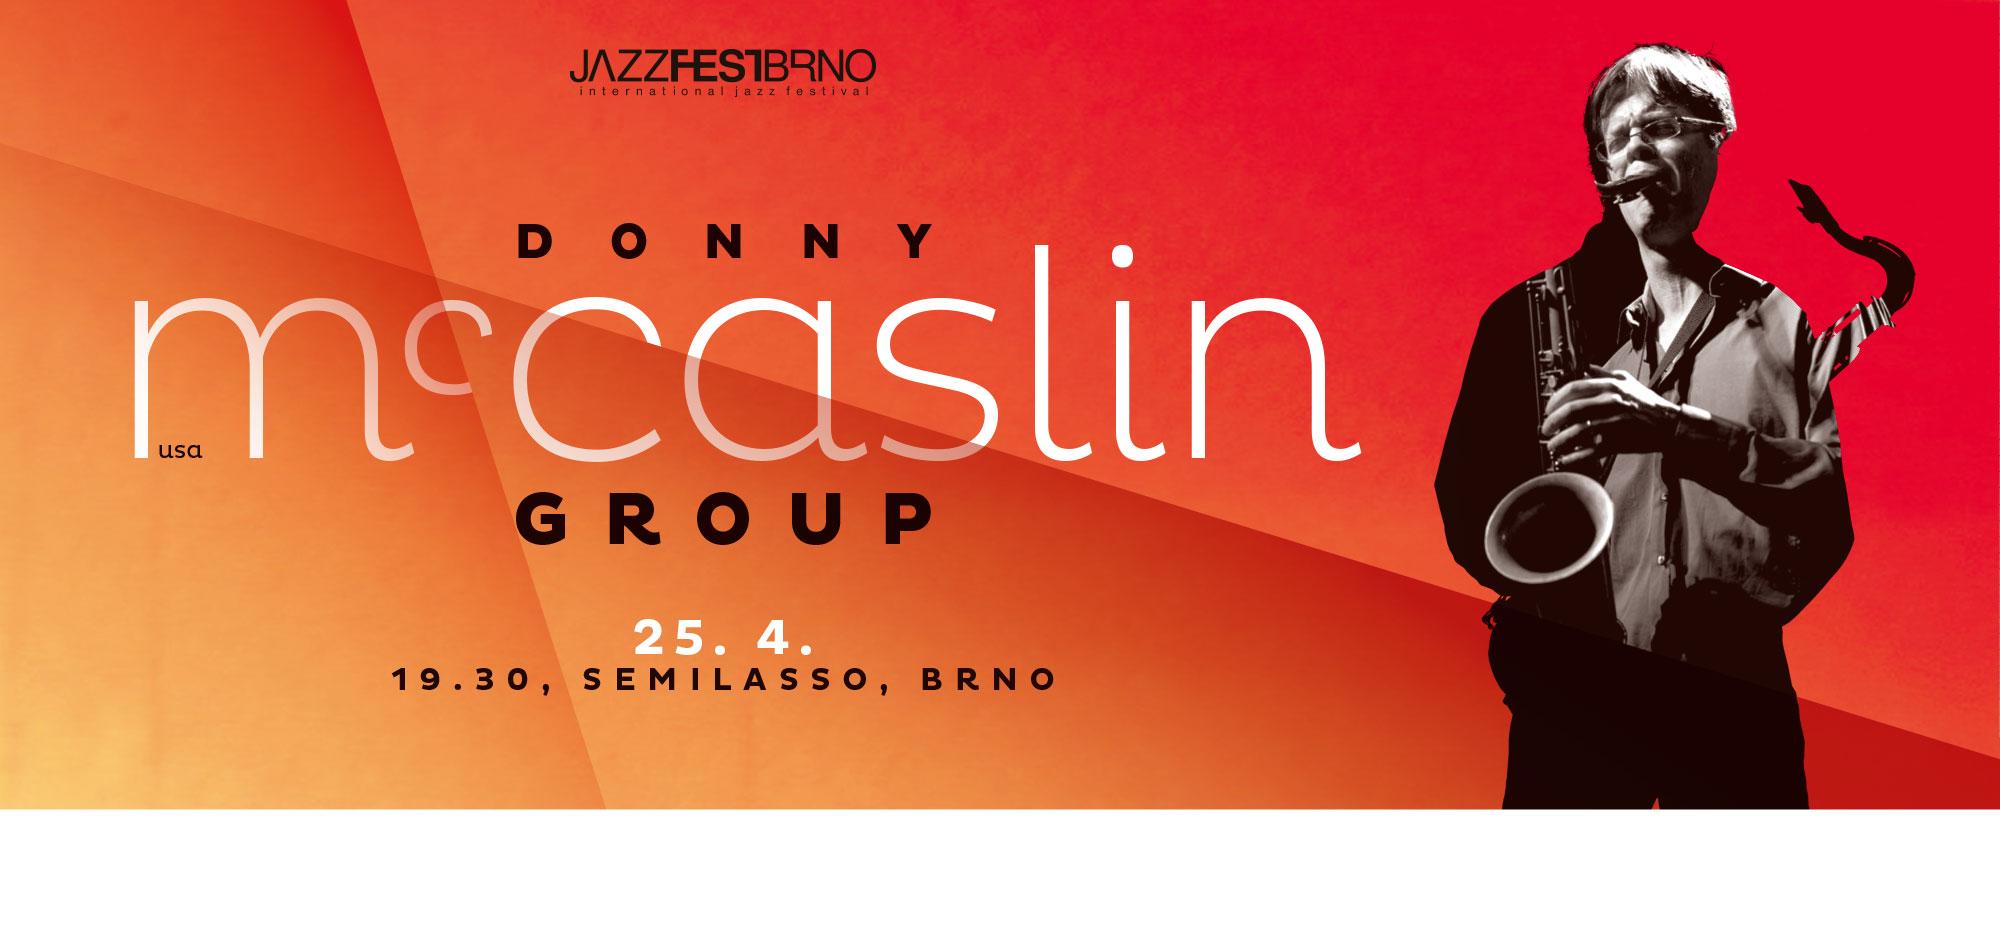 JazzFestBrno 2012 – Donny McCaslin